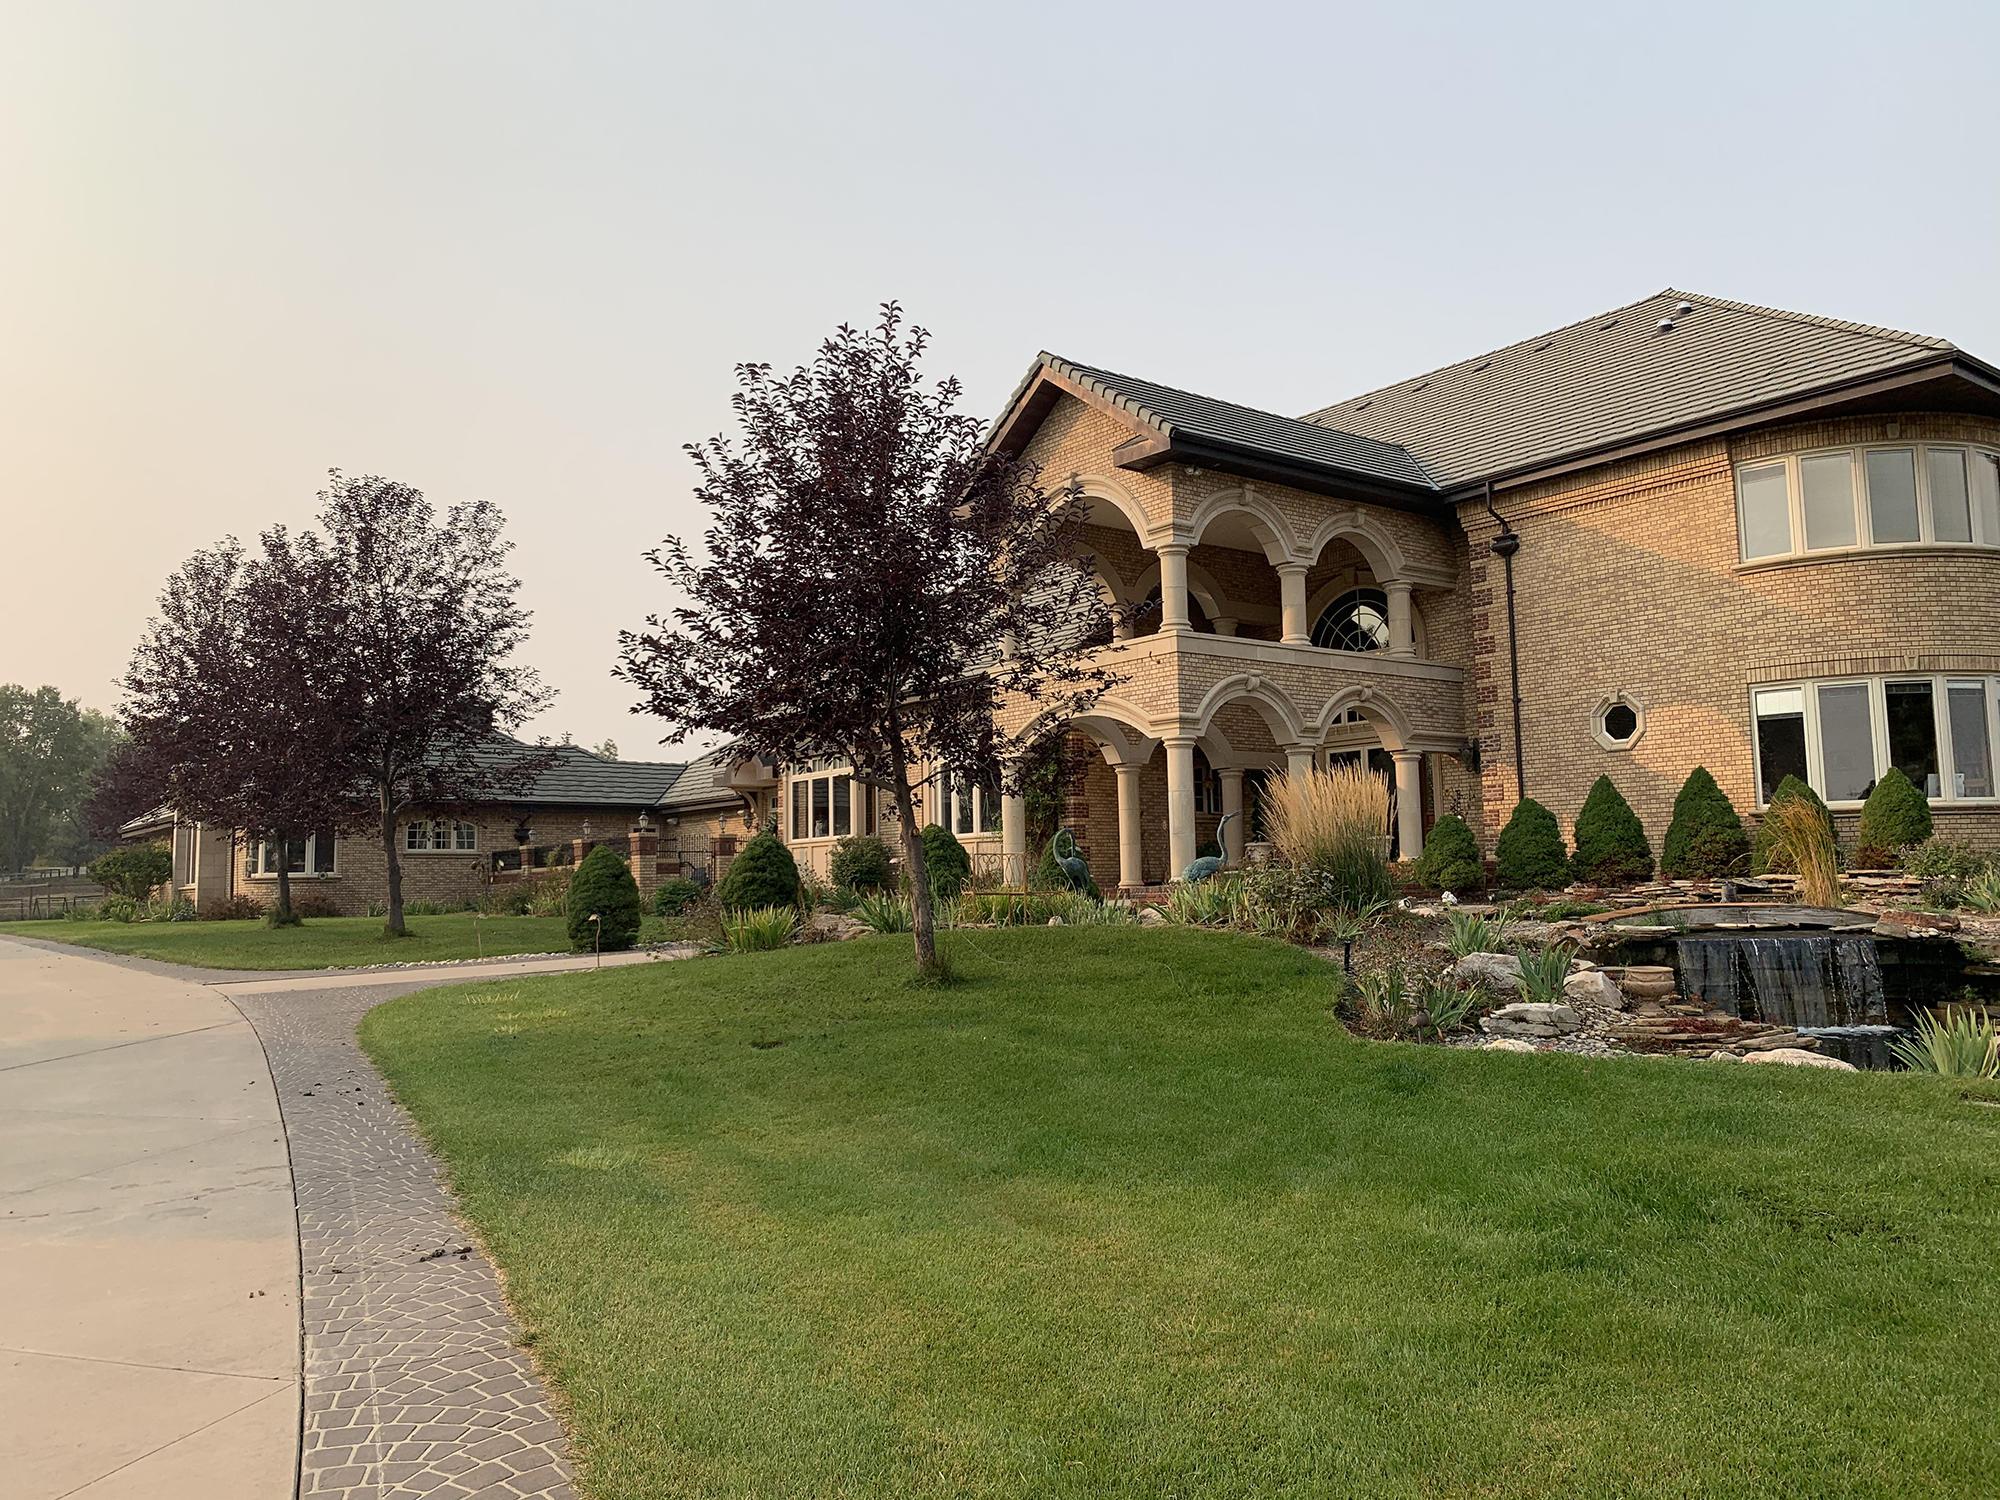 18 Beaver Drive, Sheridan, Wyoming 82801, 7 Bedrooms Bedrooms, ,7 BathroomsBathrooms,Residential,For Sale,Beaver,19-958